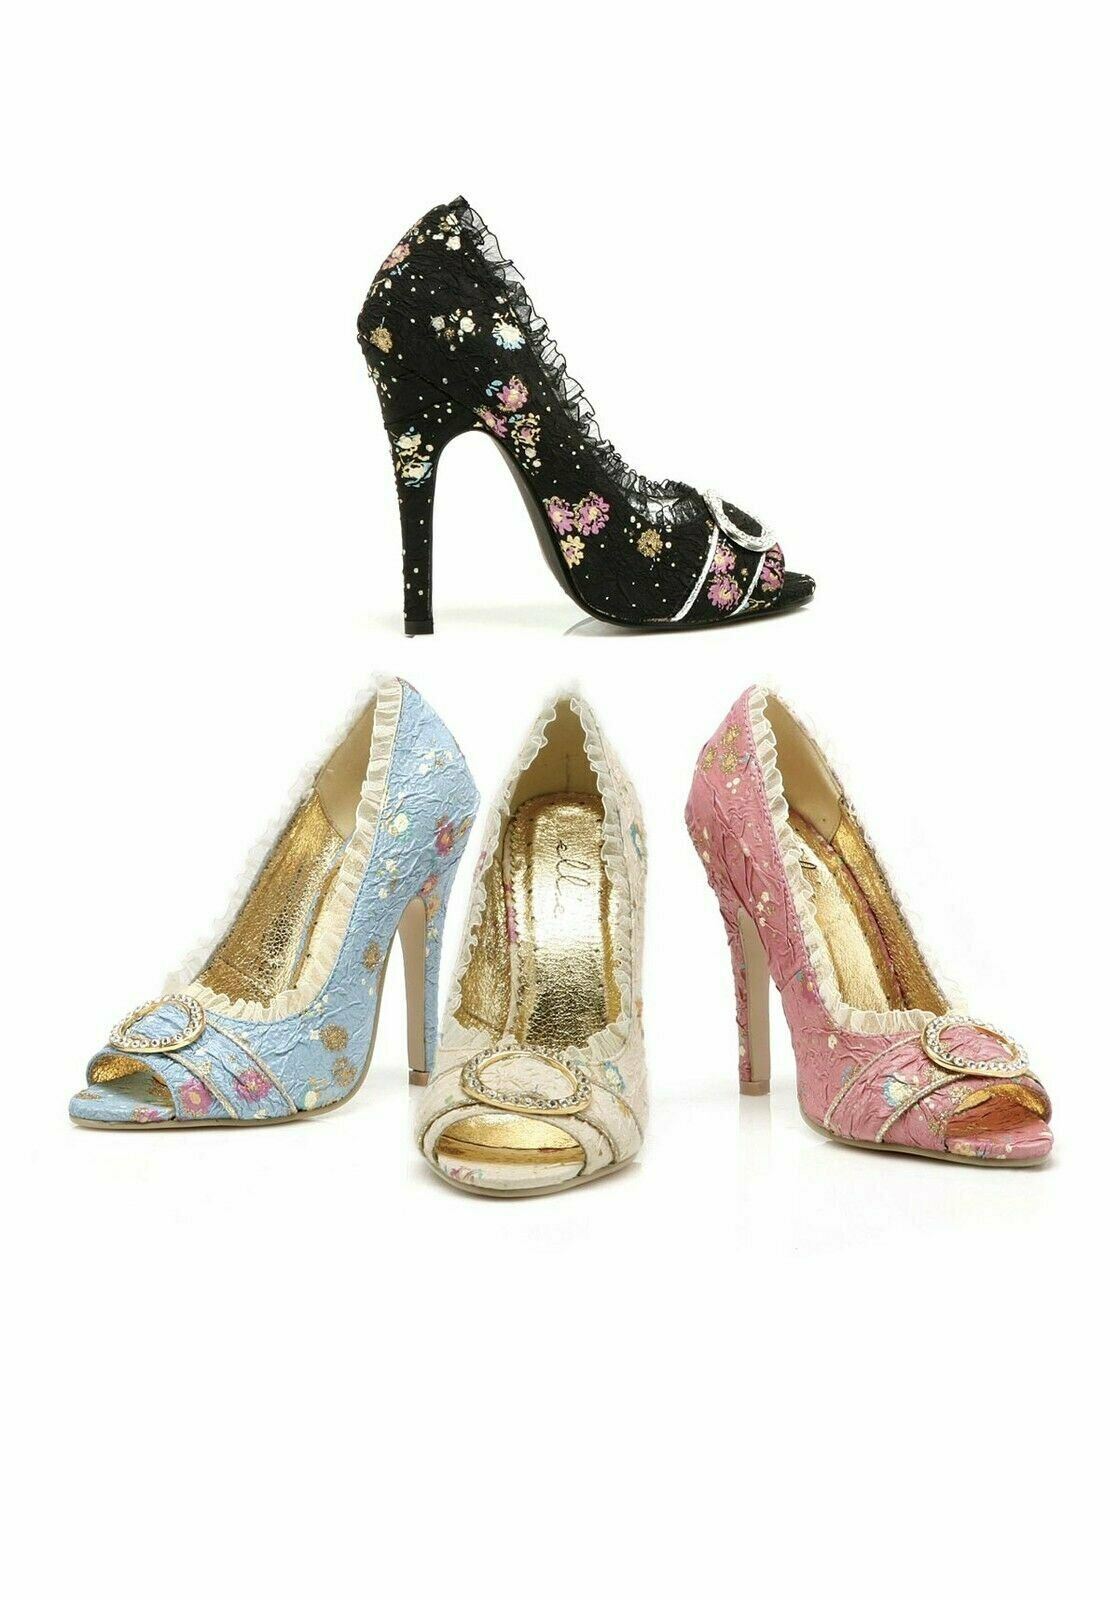 4.5/'/' Decorative Fabric Peep-Toe Women/'s Size Shoe W Rhinestones And Ruffle Trim